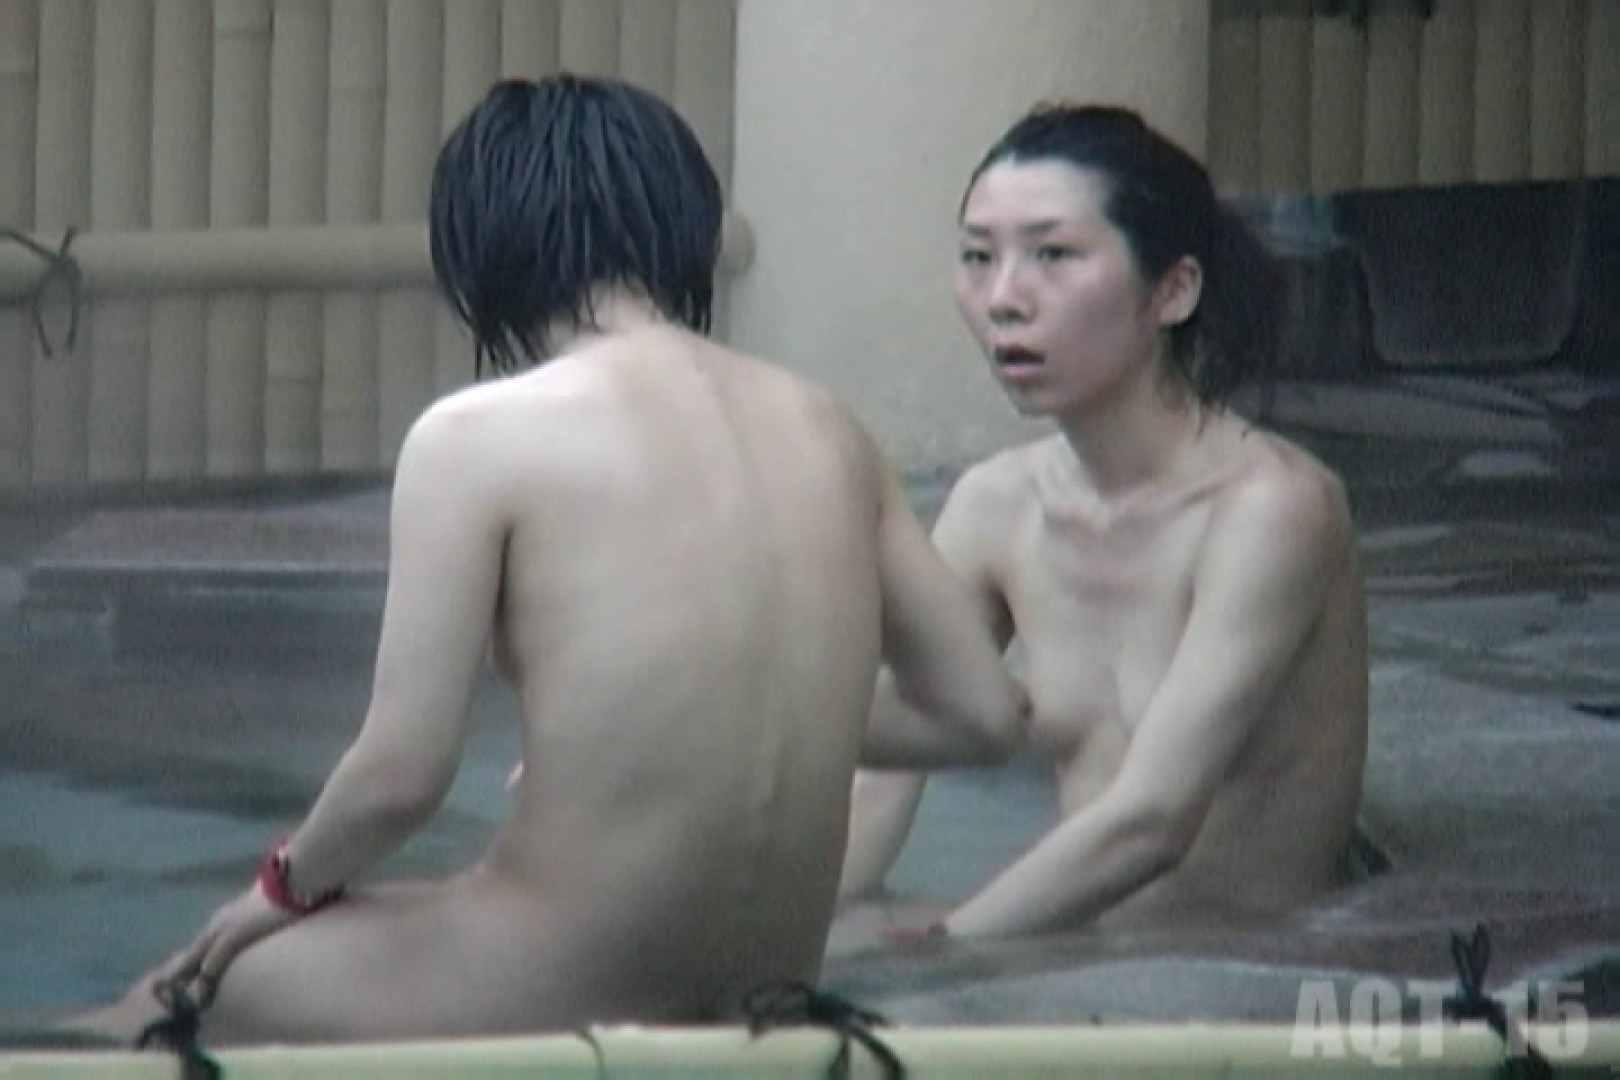 Aquaな露天風呂Vol.837 盗撮シリーズ   露天風呂編  106PIX 9